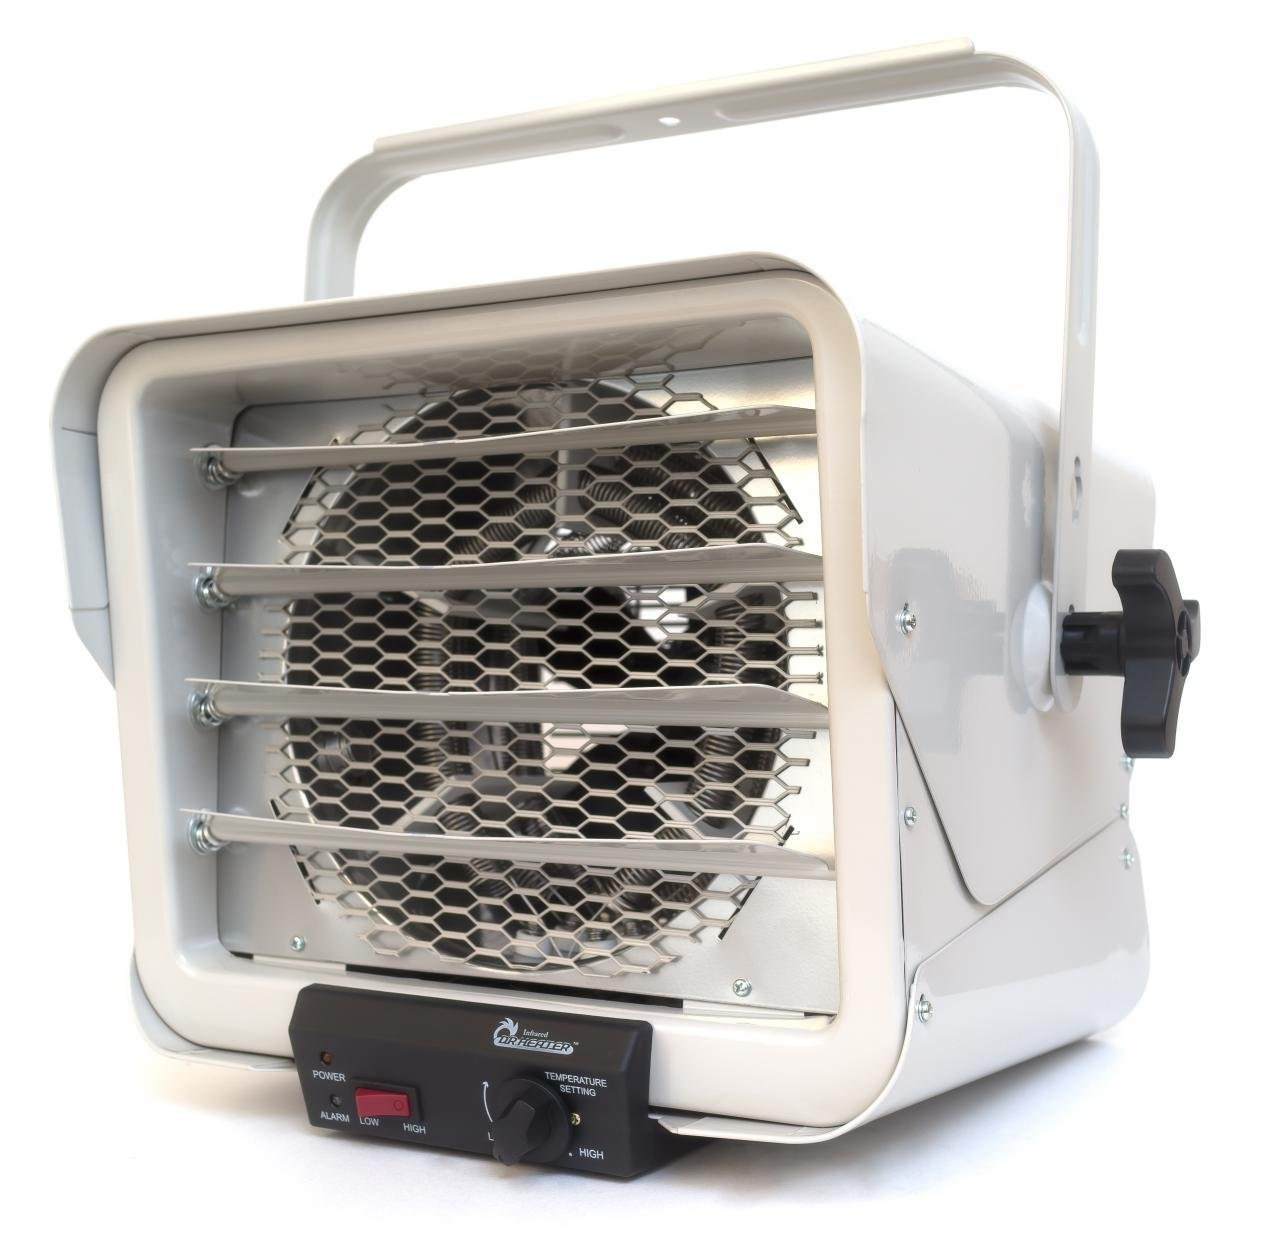 Dr. Heater DR966 240-volt Hardwired Shop Garage Commercial Heater, 3000-watt/6000-watt